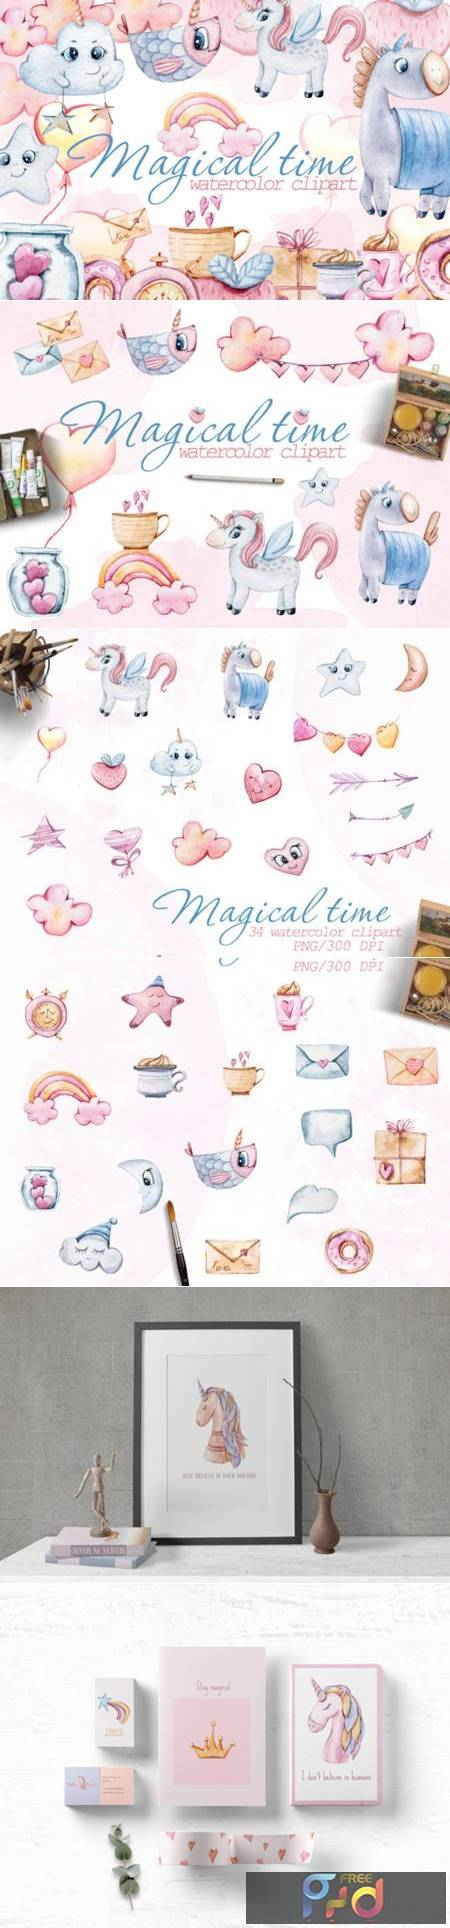 Watercolor Nursery Valentine Clipart 6975245 1